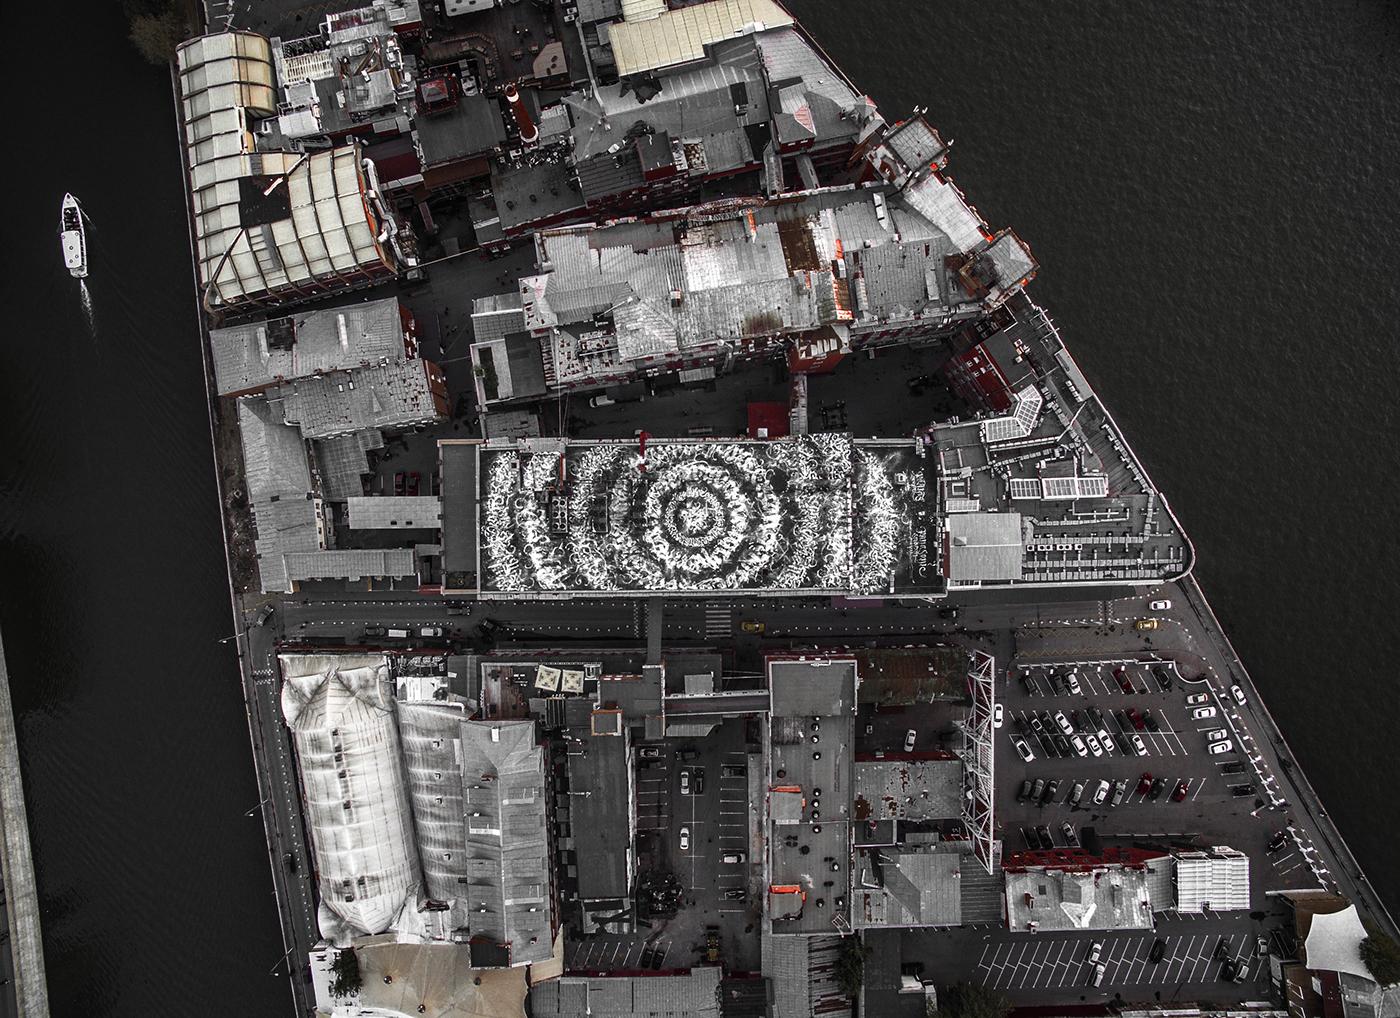 pokras pokras lampas calligraffiti artwork huge rooftop Voogie Red october Russia покрас